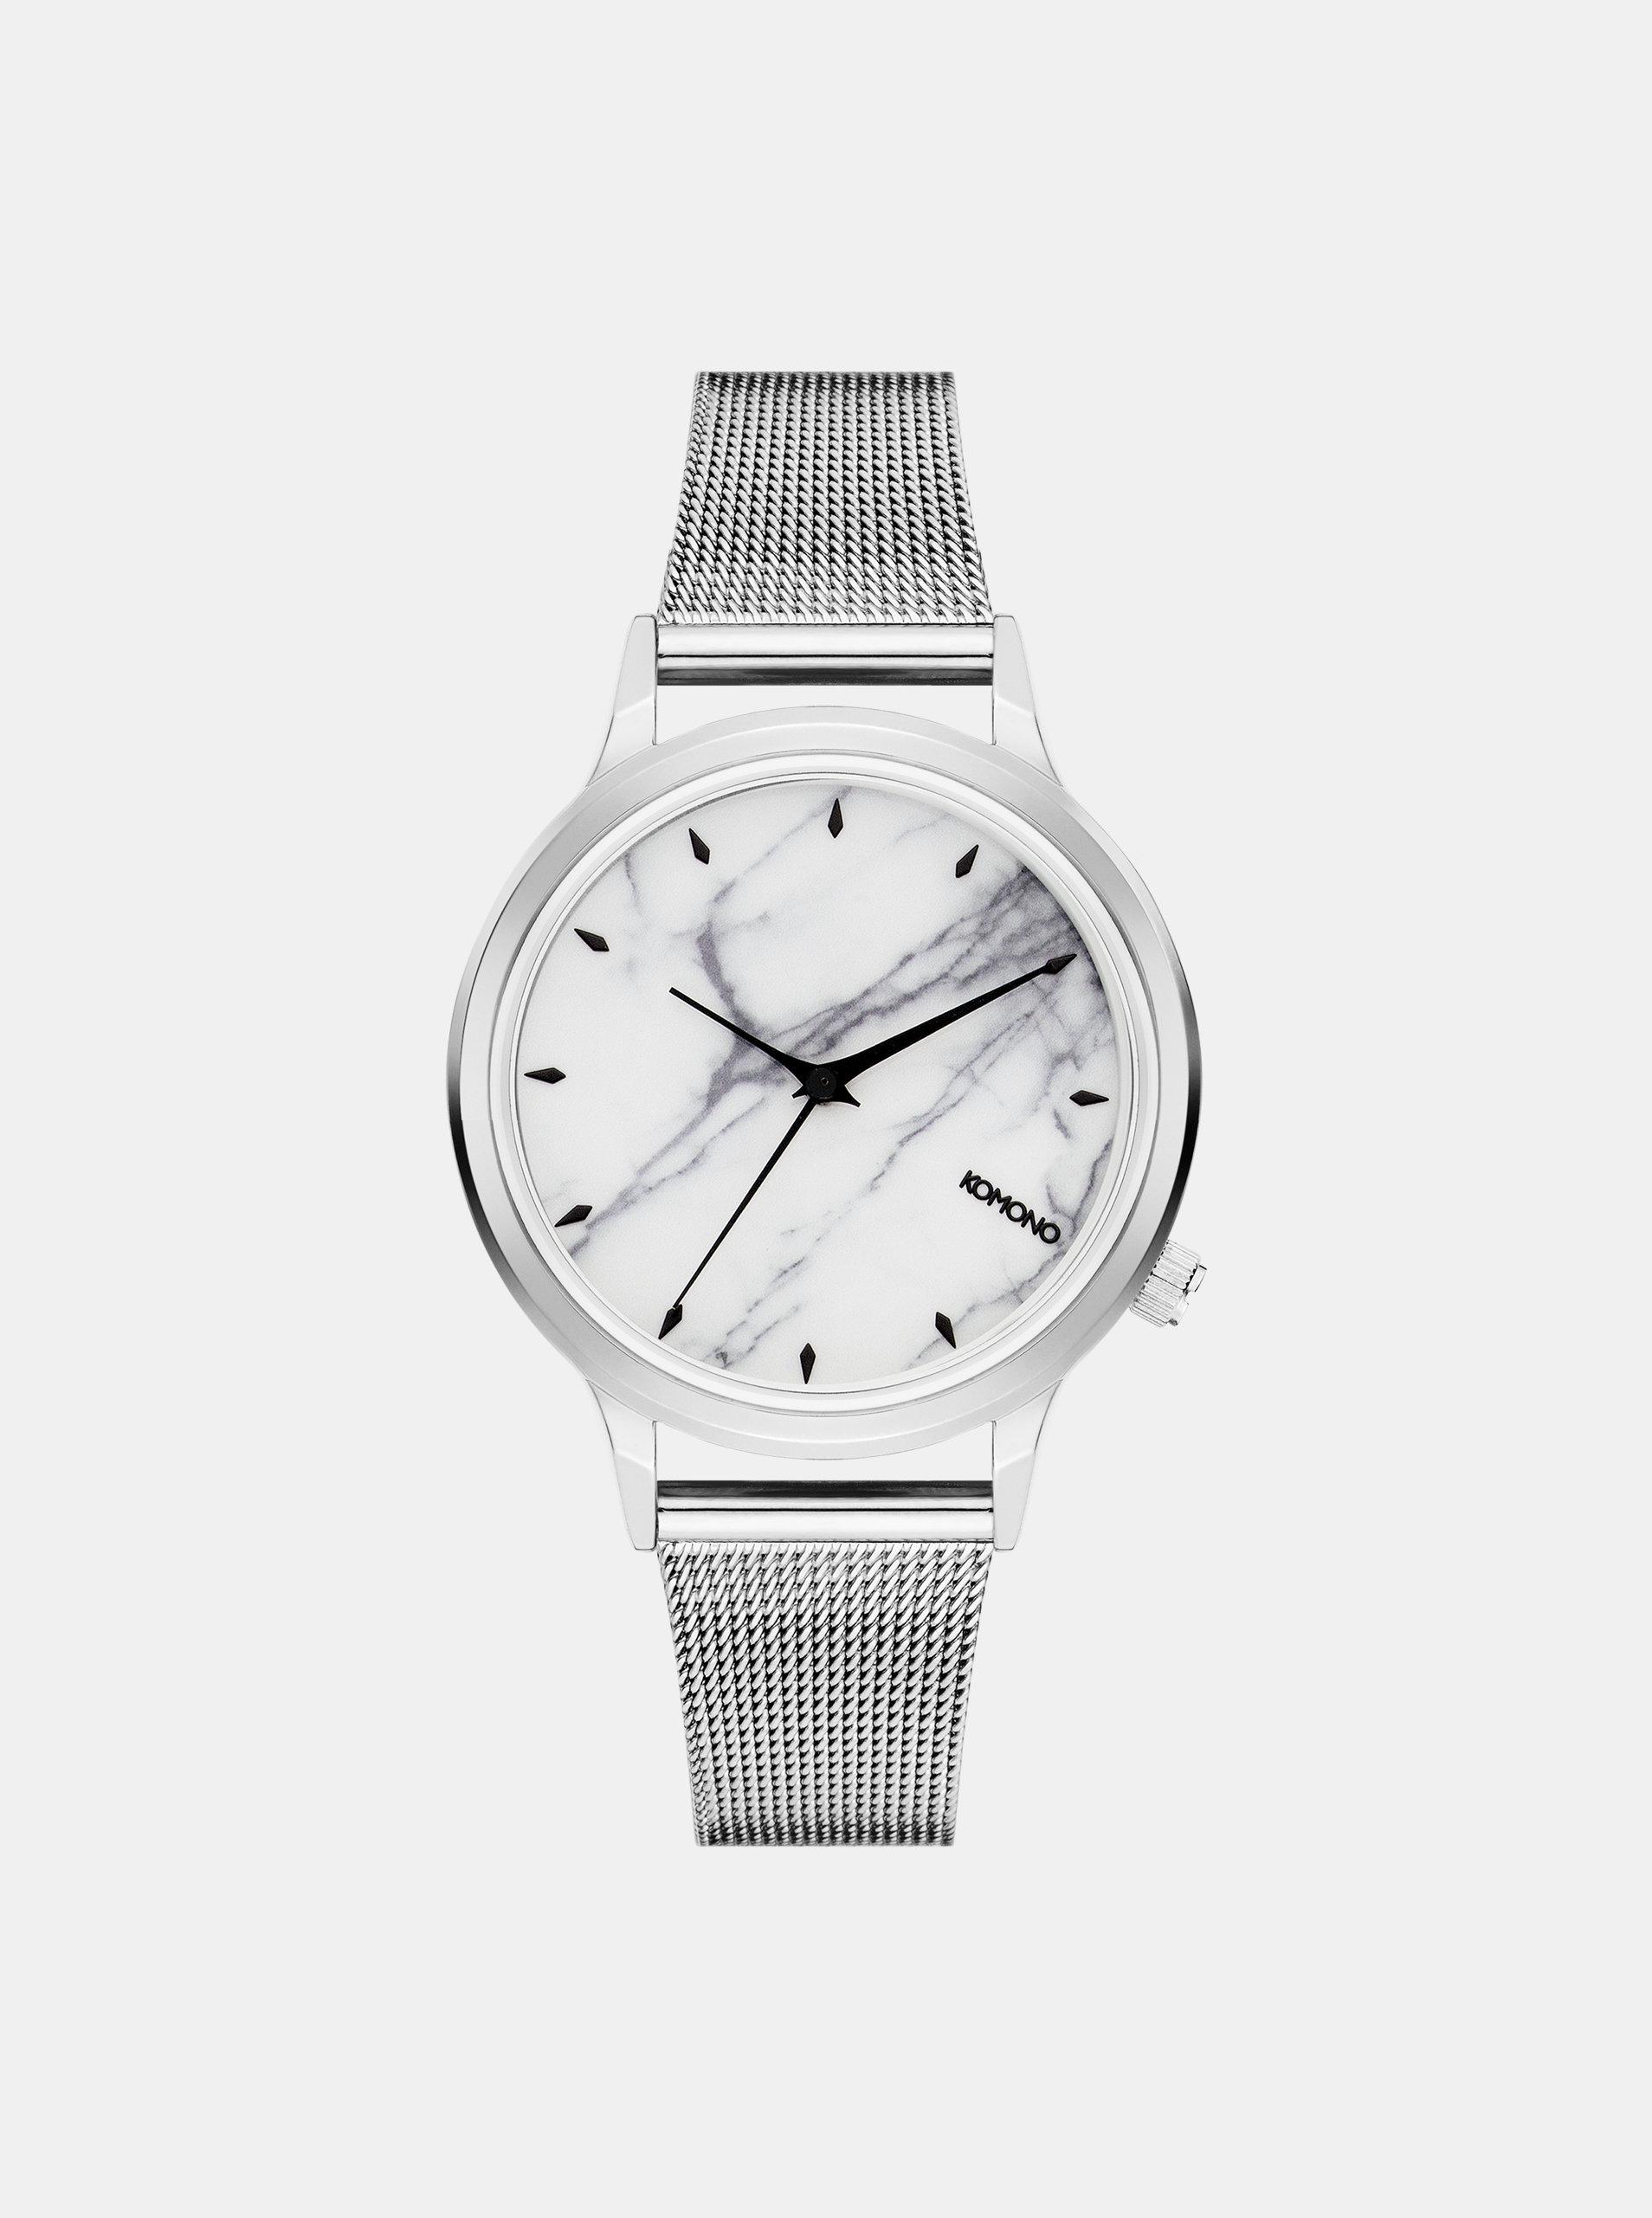 30d6bb2adf6 Dámské hodinky s páskem ve stříbrné barvě a mramorovaným ciferníkem Komono  Silver White Marble ...